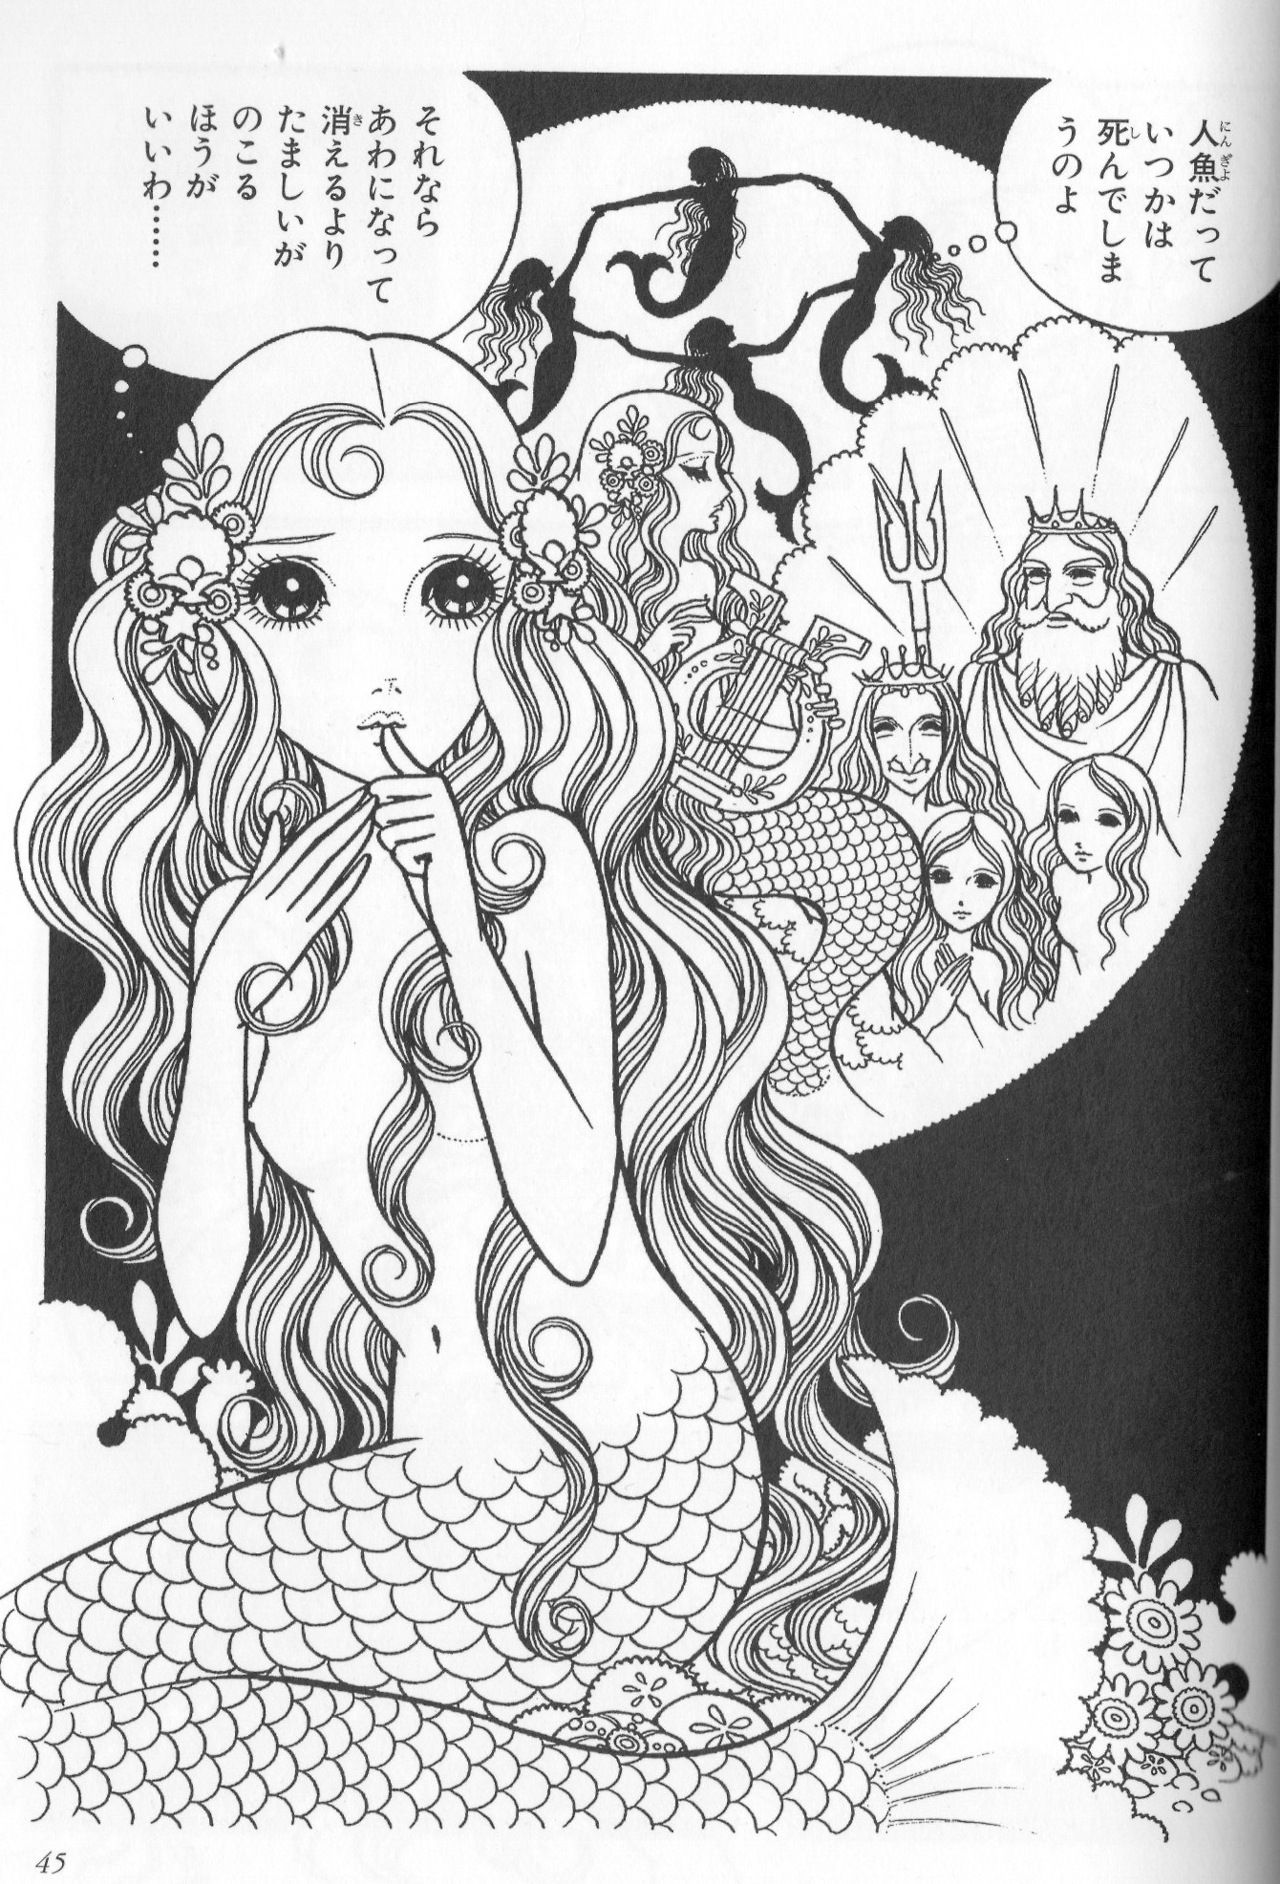 takahashi macoto � the little mermaid vintage manga